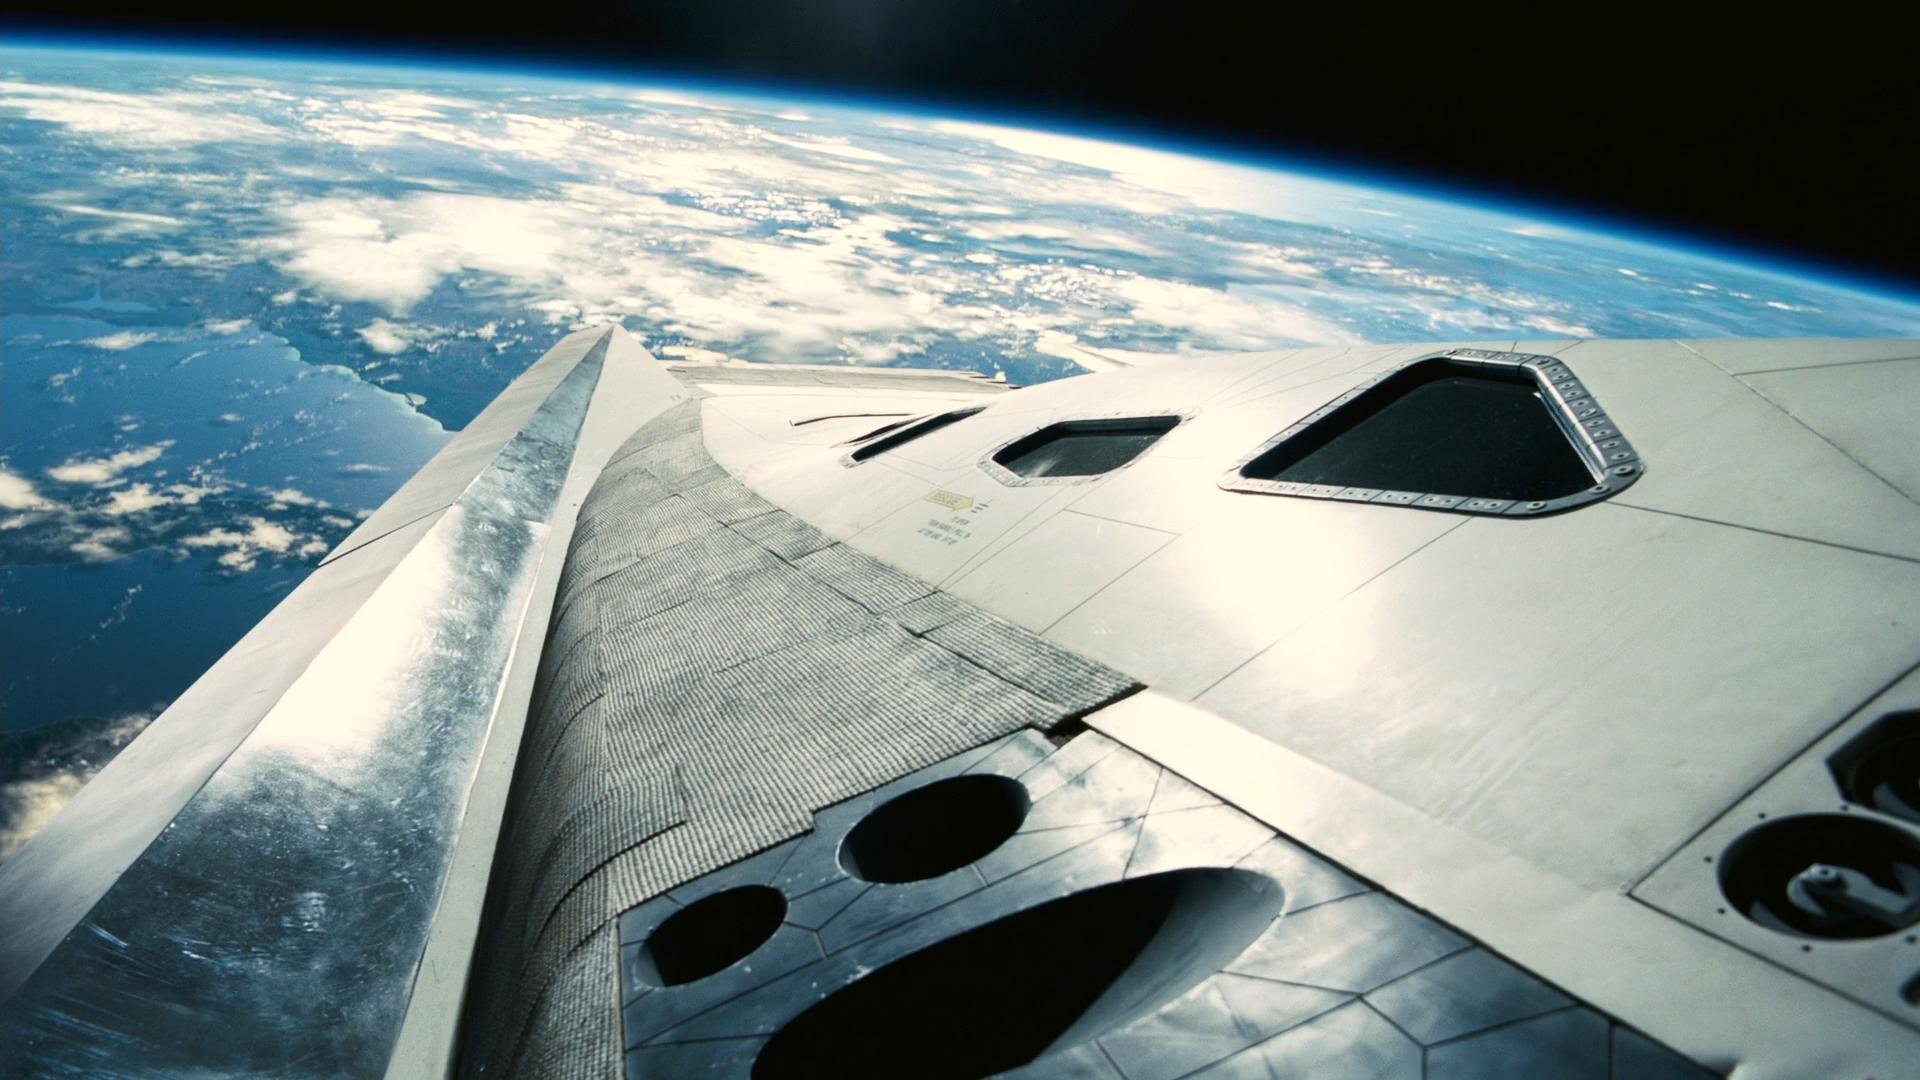 Wallpaper Vehicle Airplane Aircraft Movies Interstellar Movie Film Stills Flight Aviation Wing Screenshot Spacecraft Atmosphere Of Earth Outer Space Air Travel Aerospace Engineering Spaceplane 1920x1080 Spacer 151166 Hd